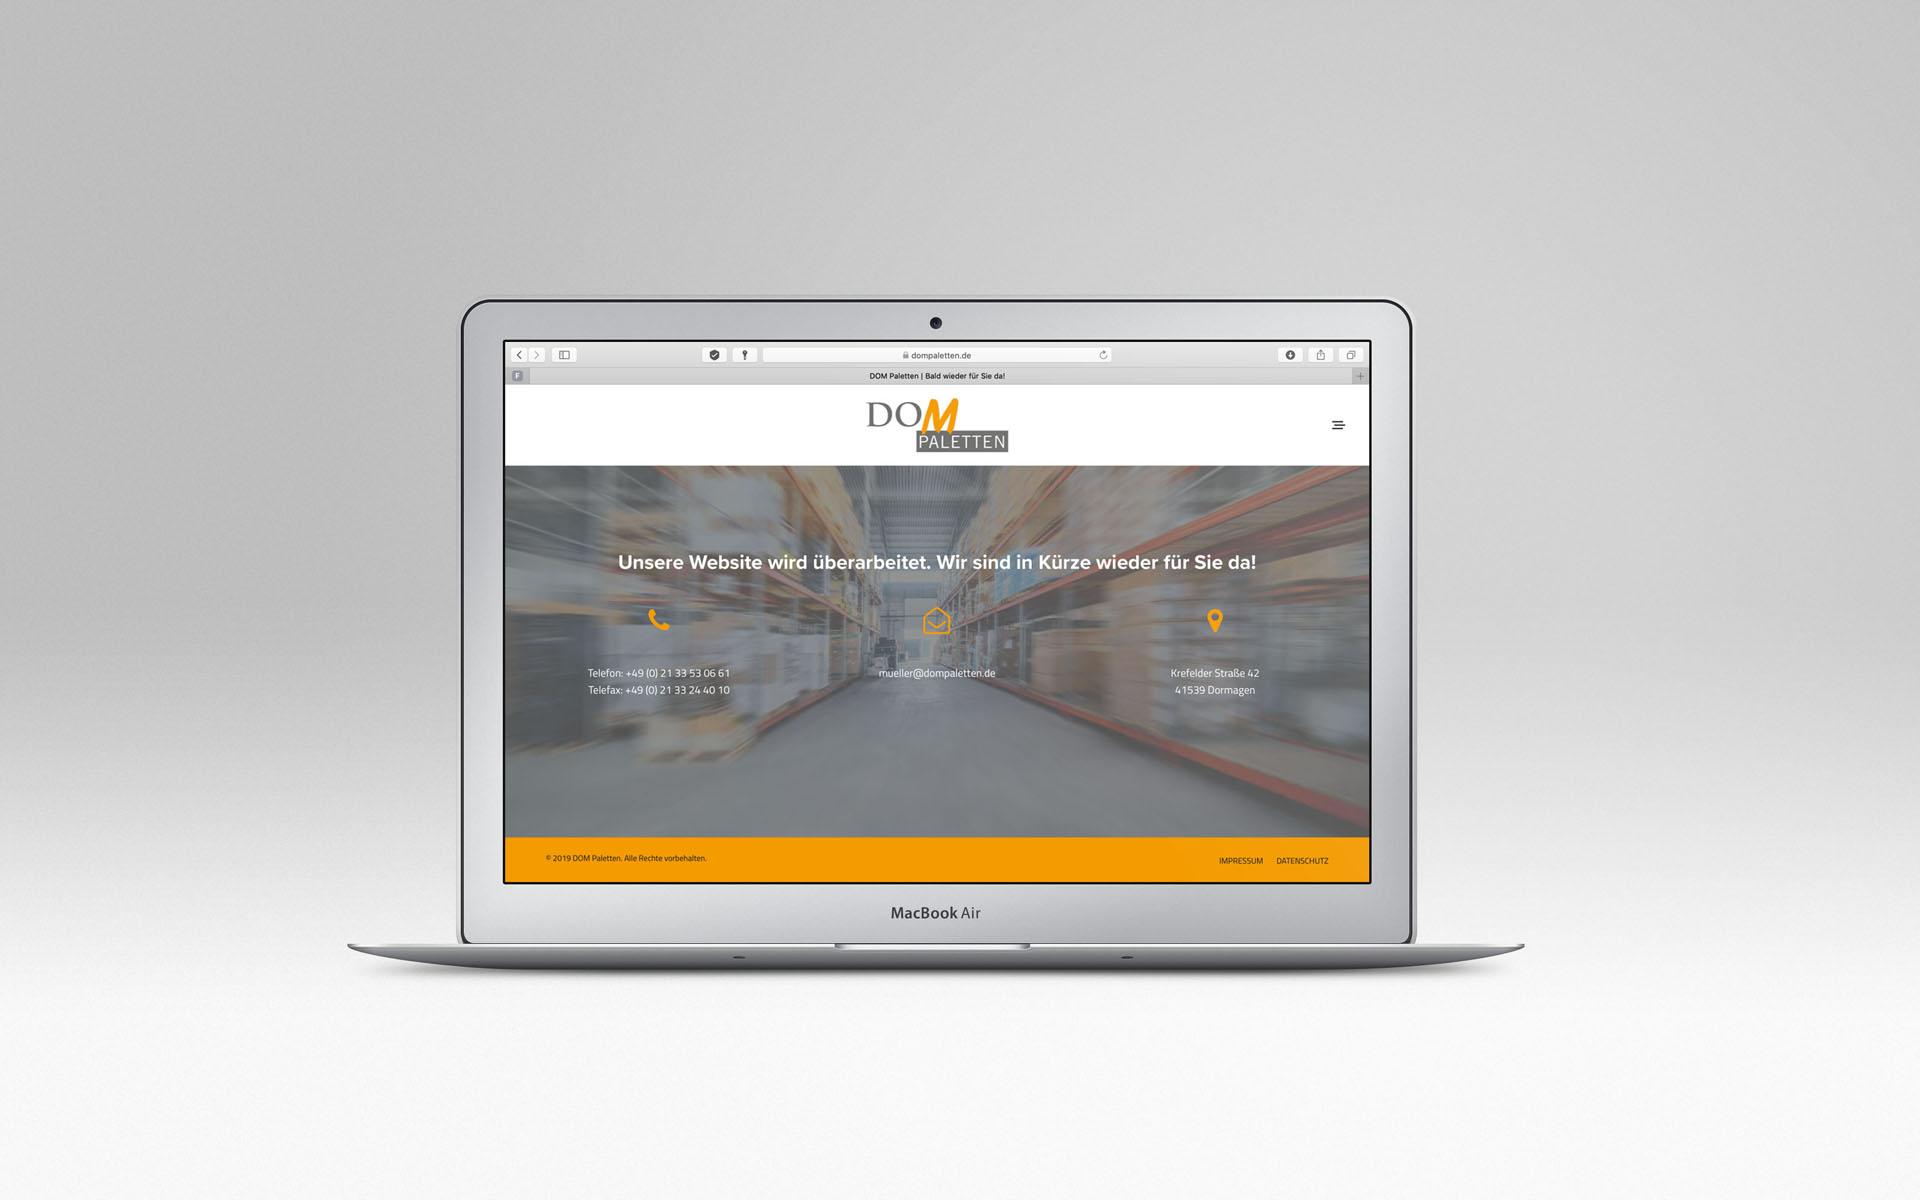 bc-projekt-dompaletten-01-2019-webdesign